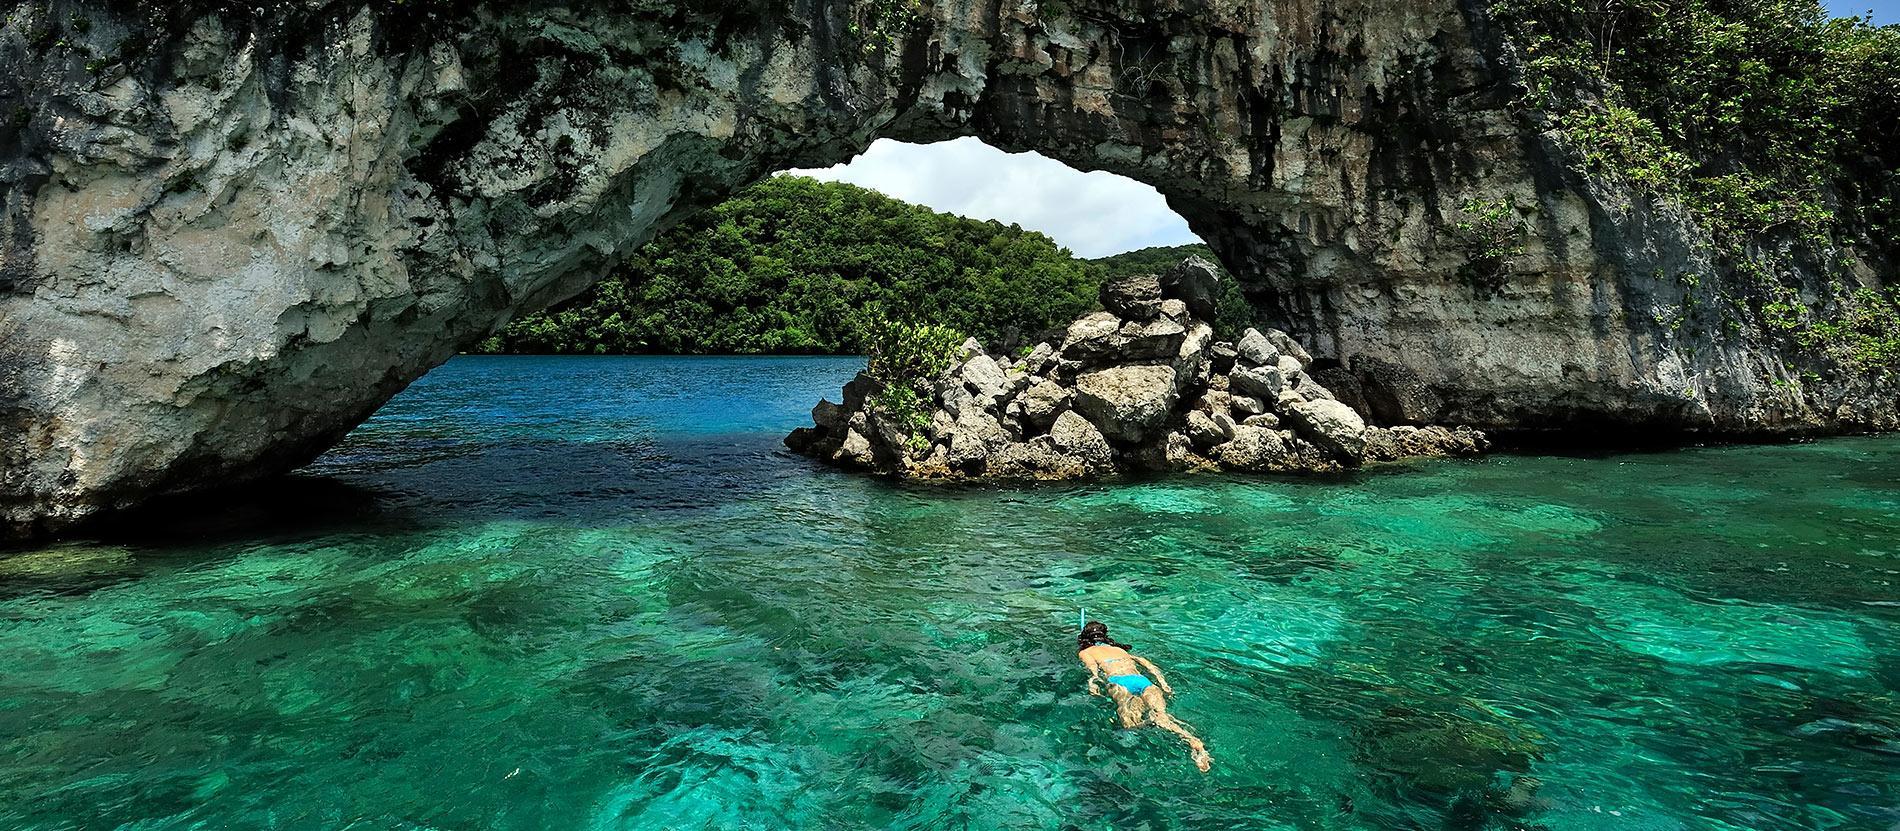 Palau Snorkeling Tour Kayaking Palau Trips 2021 National Geographic Expeditions